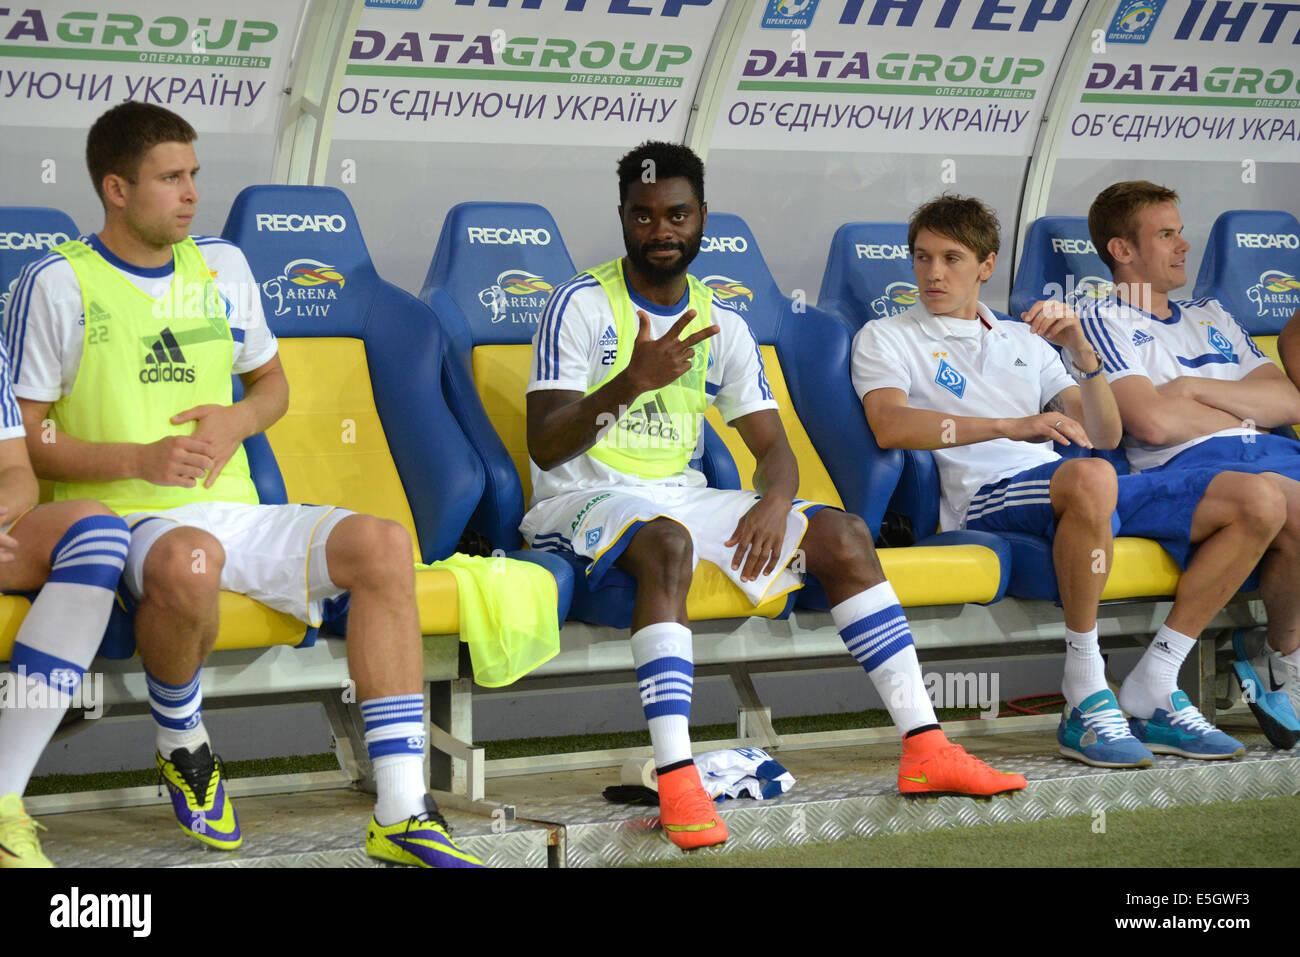 LUKMAN HARUNA during the match Inter between 'Shakhtar' (Donetsk City) and Dynamo (Kyiv) at Stadium Arena - Stock Image